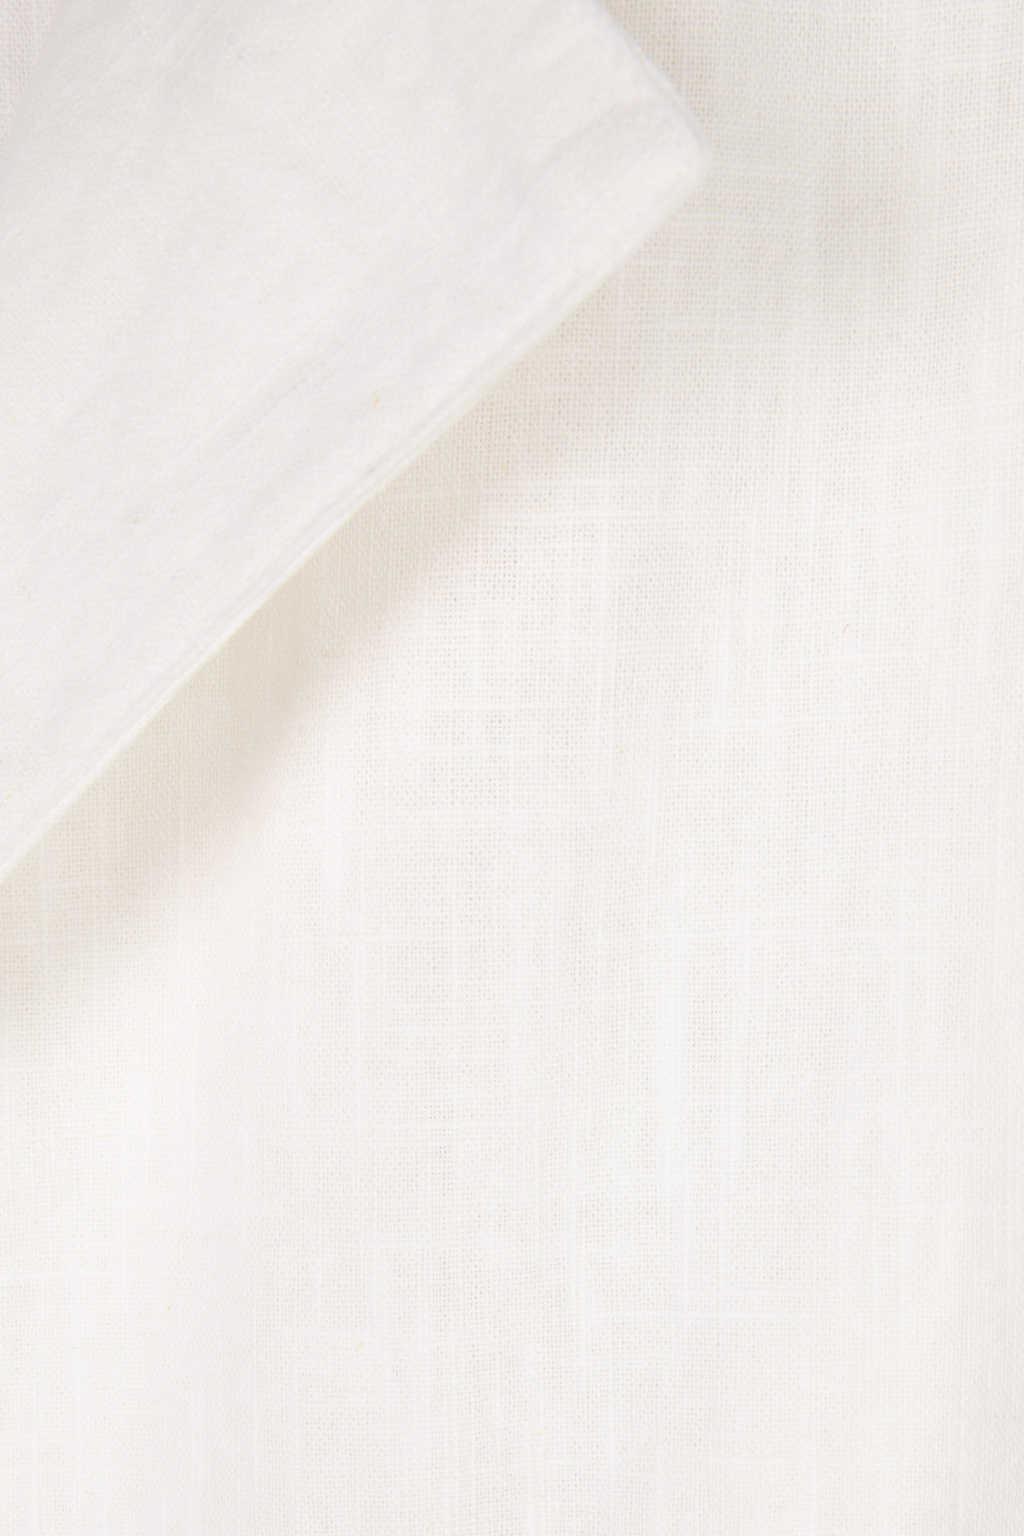 Jacket K019 Cream 7